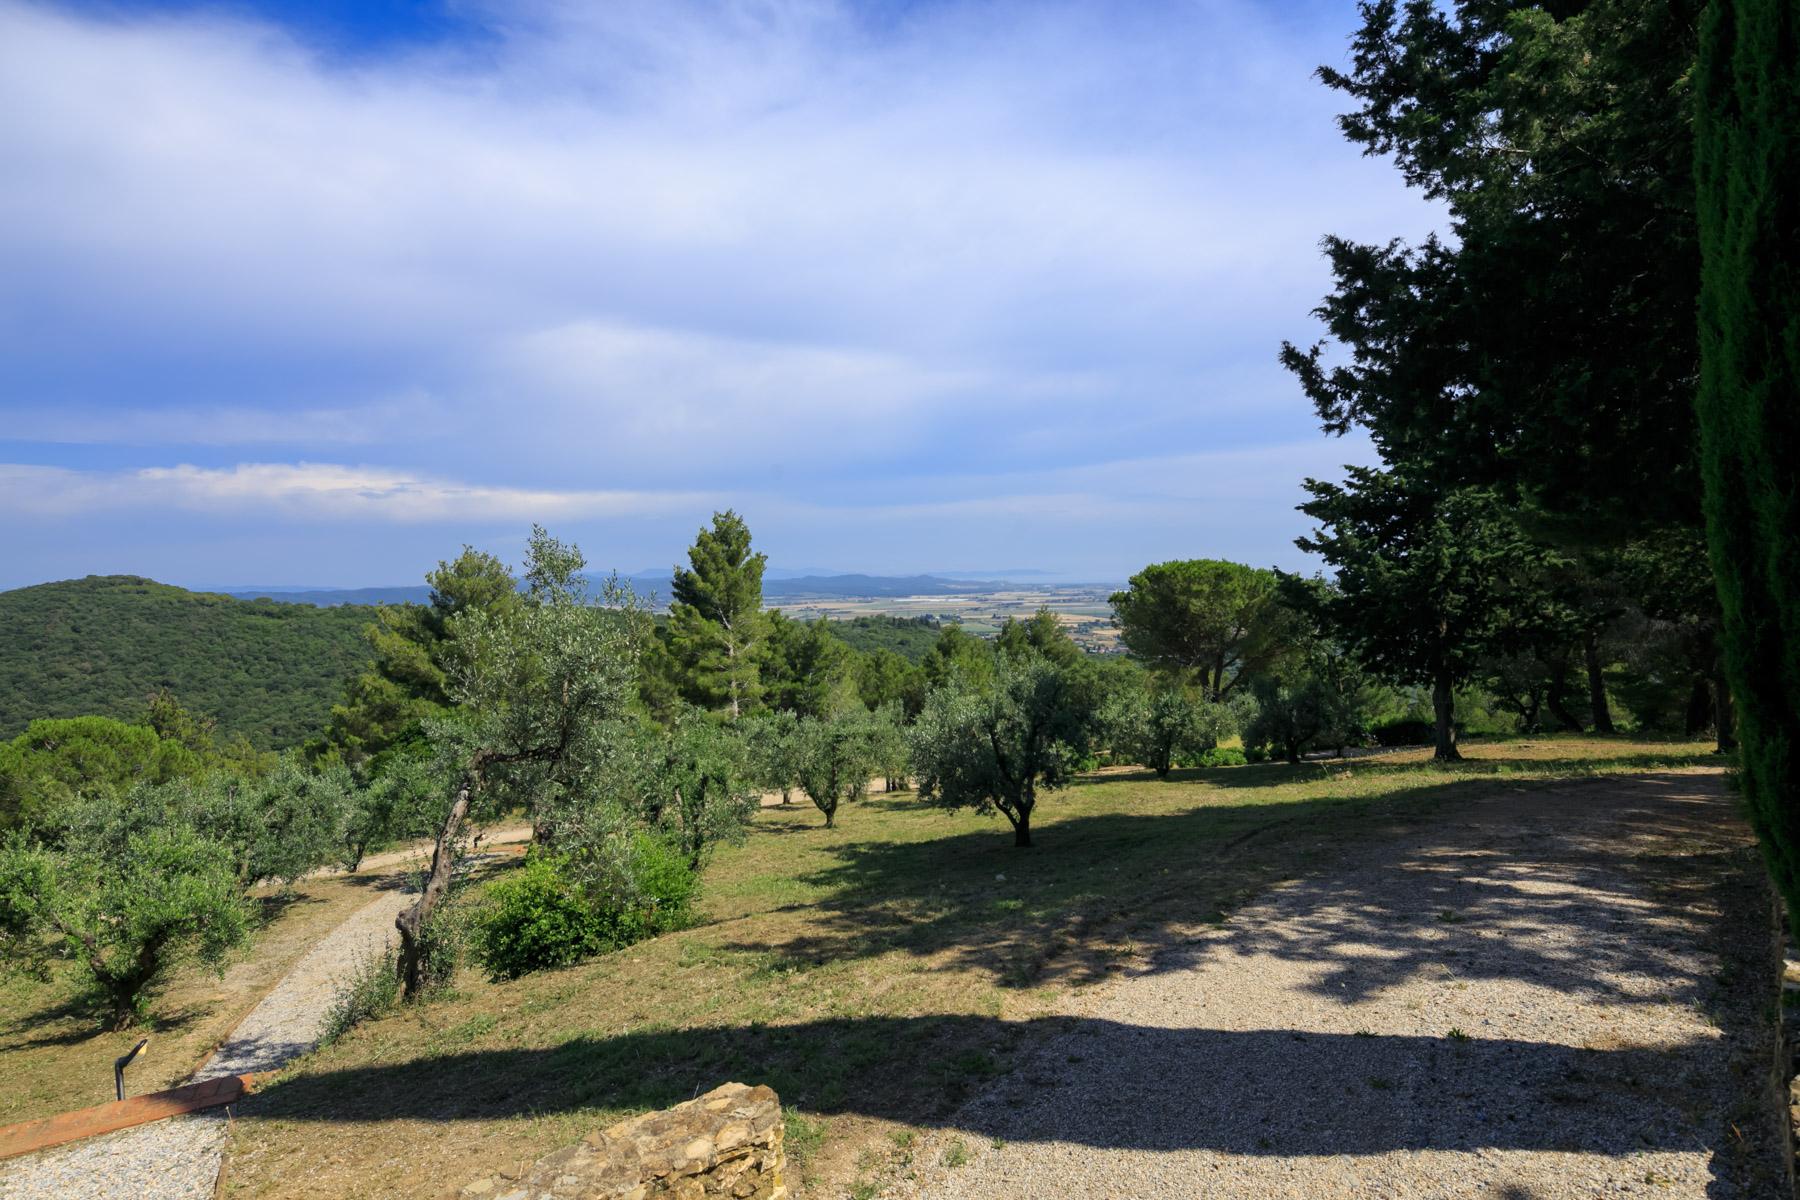 Villa in Vendita a Campiglia Marittima: 5 locali, 1100 mq - Foto 13